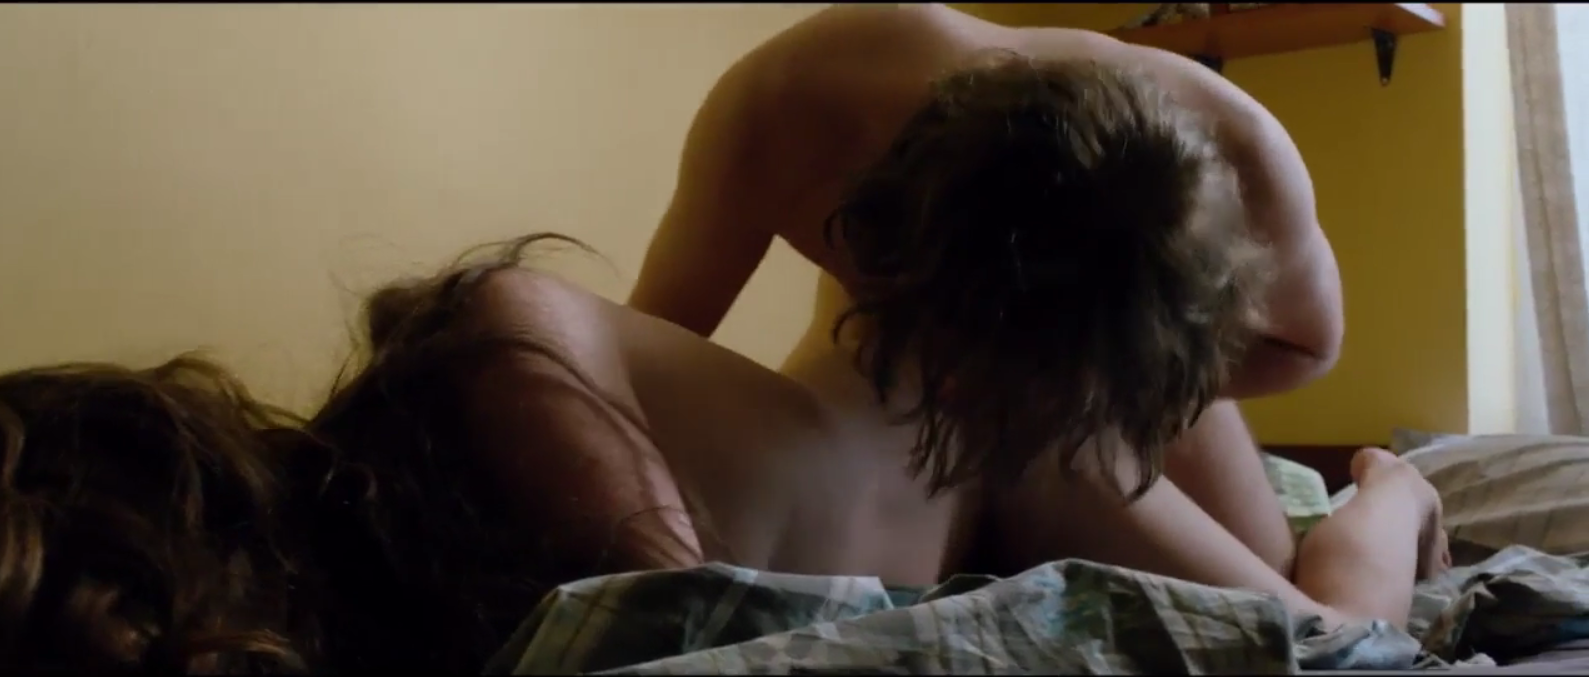 Diana Sex Video 63